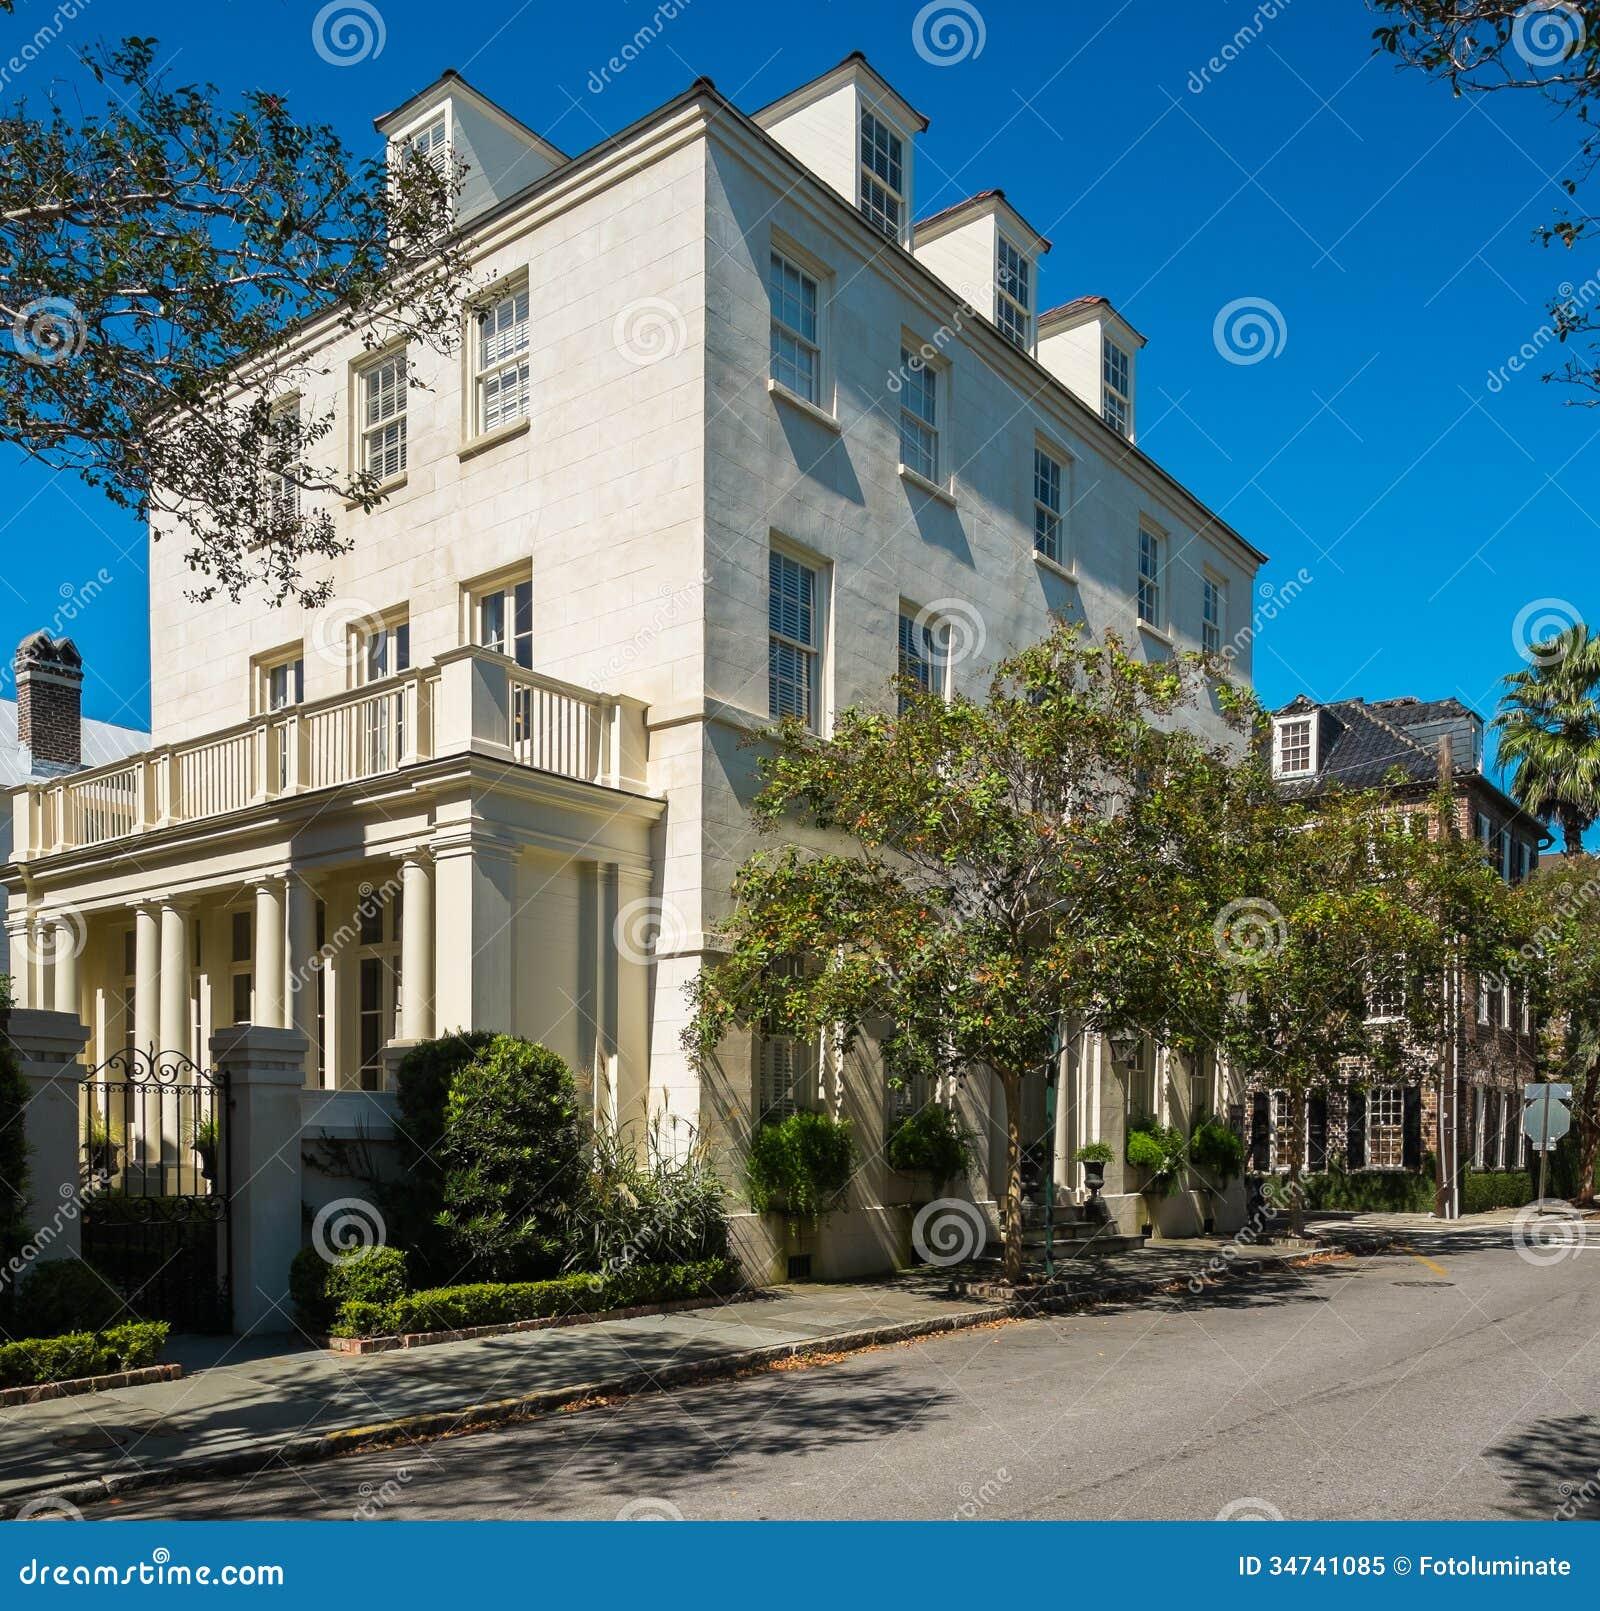 Charleston Sc Homes: Southern Homes Royalty Free Stock Photo